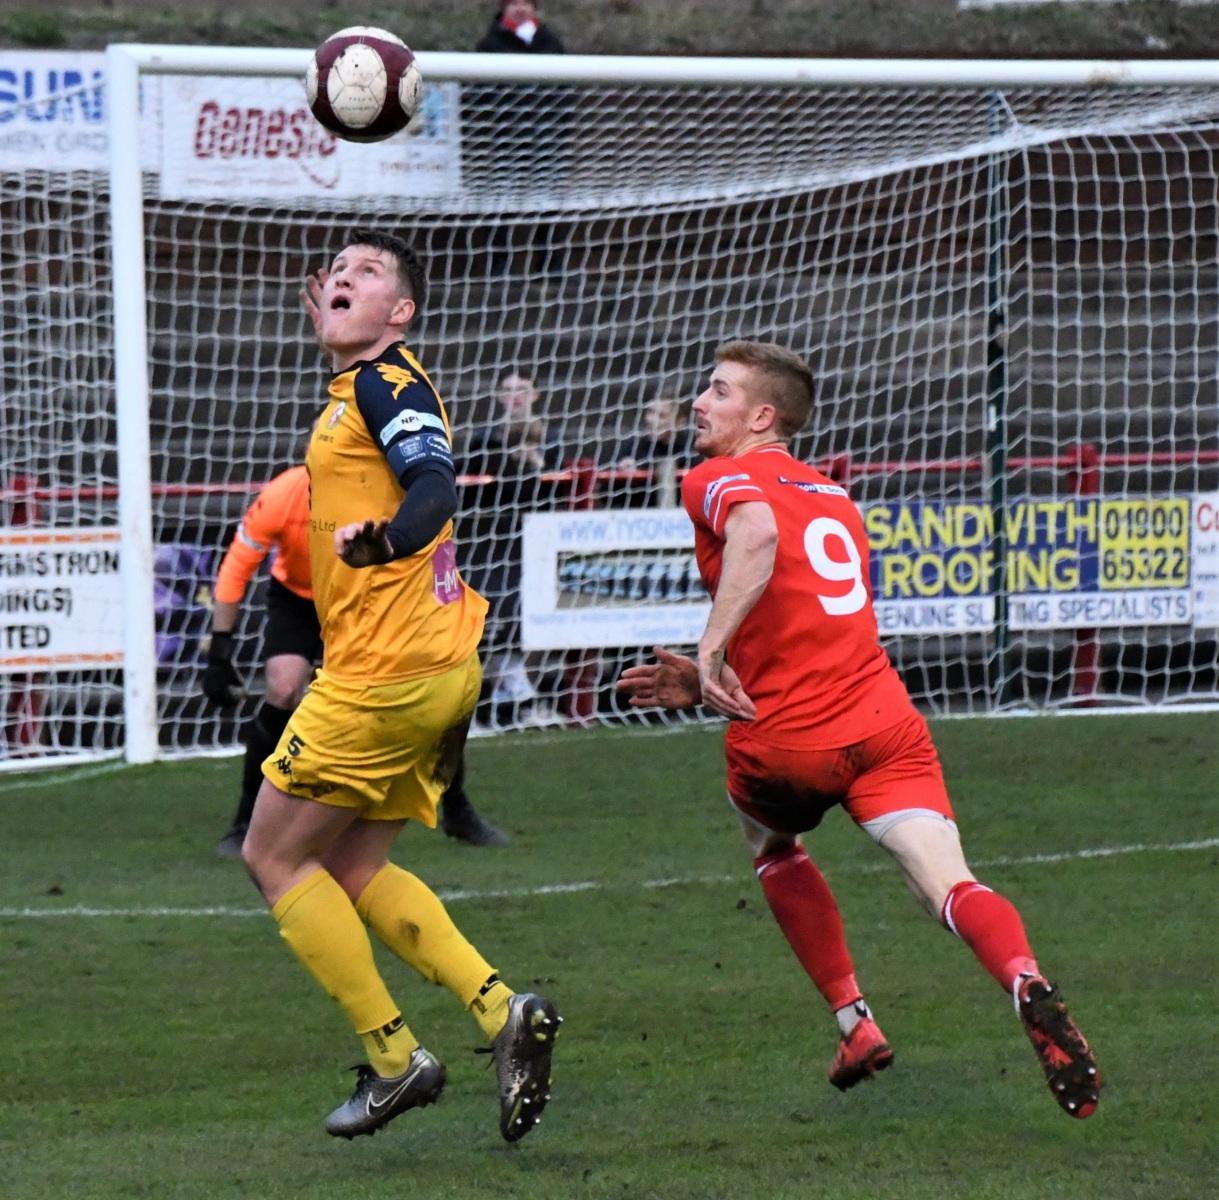 Workington-Reds-v-Trafford-Ben-Challis-8-scaled